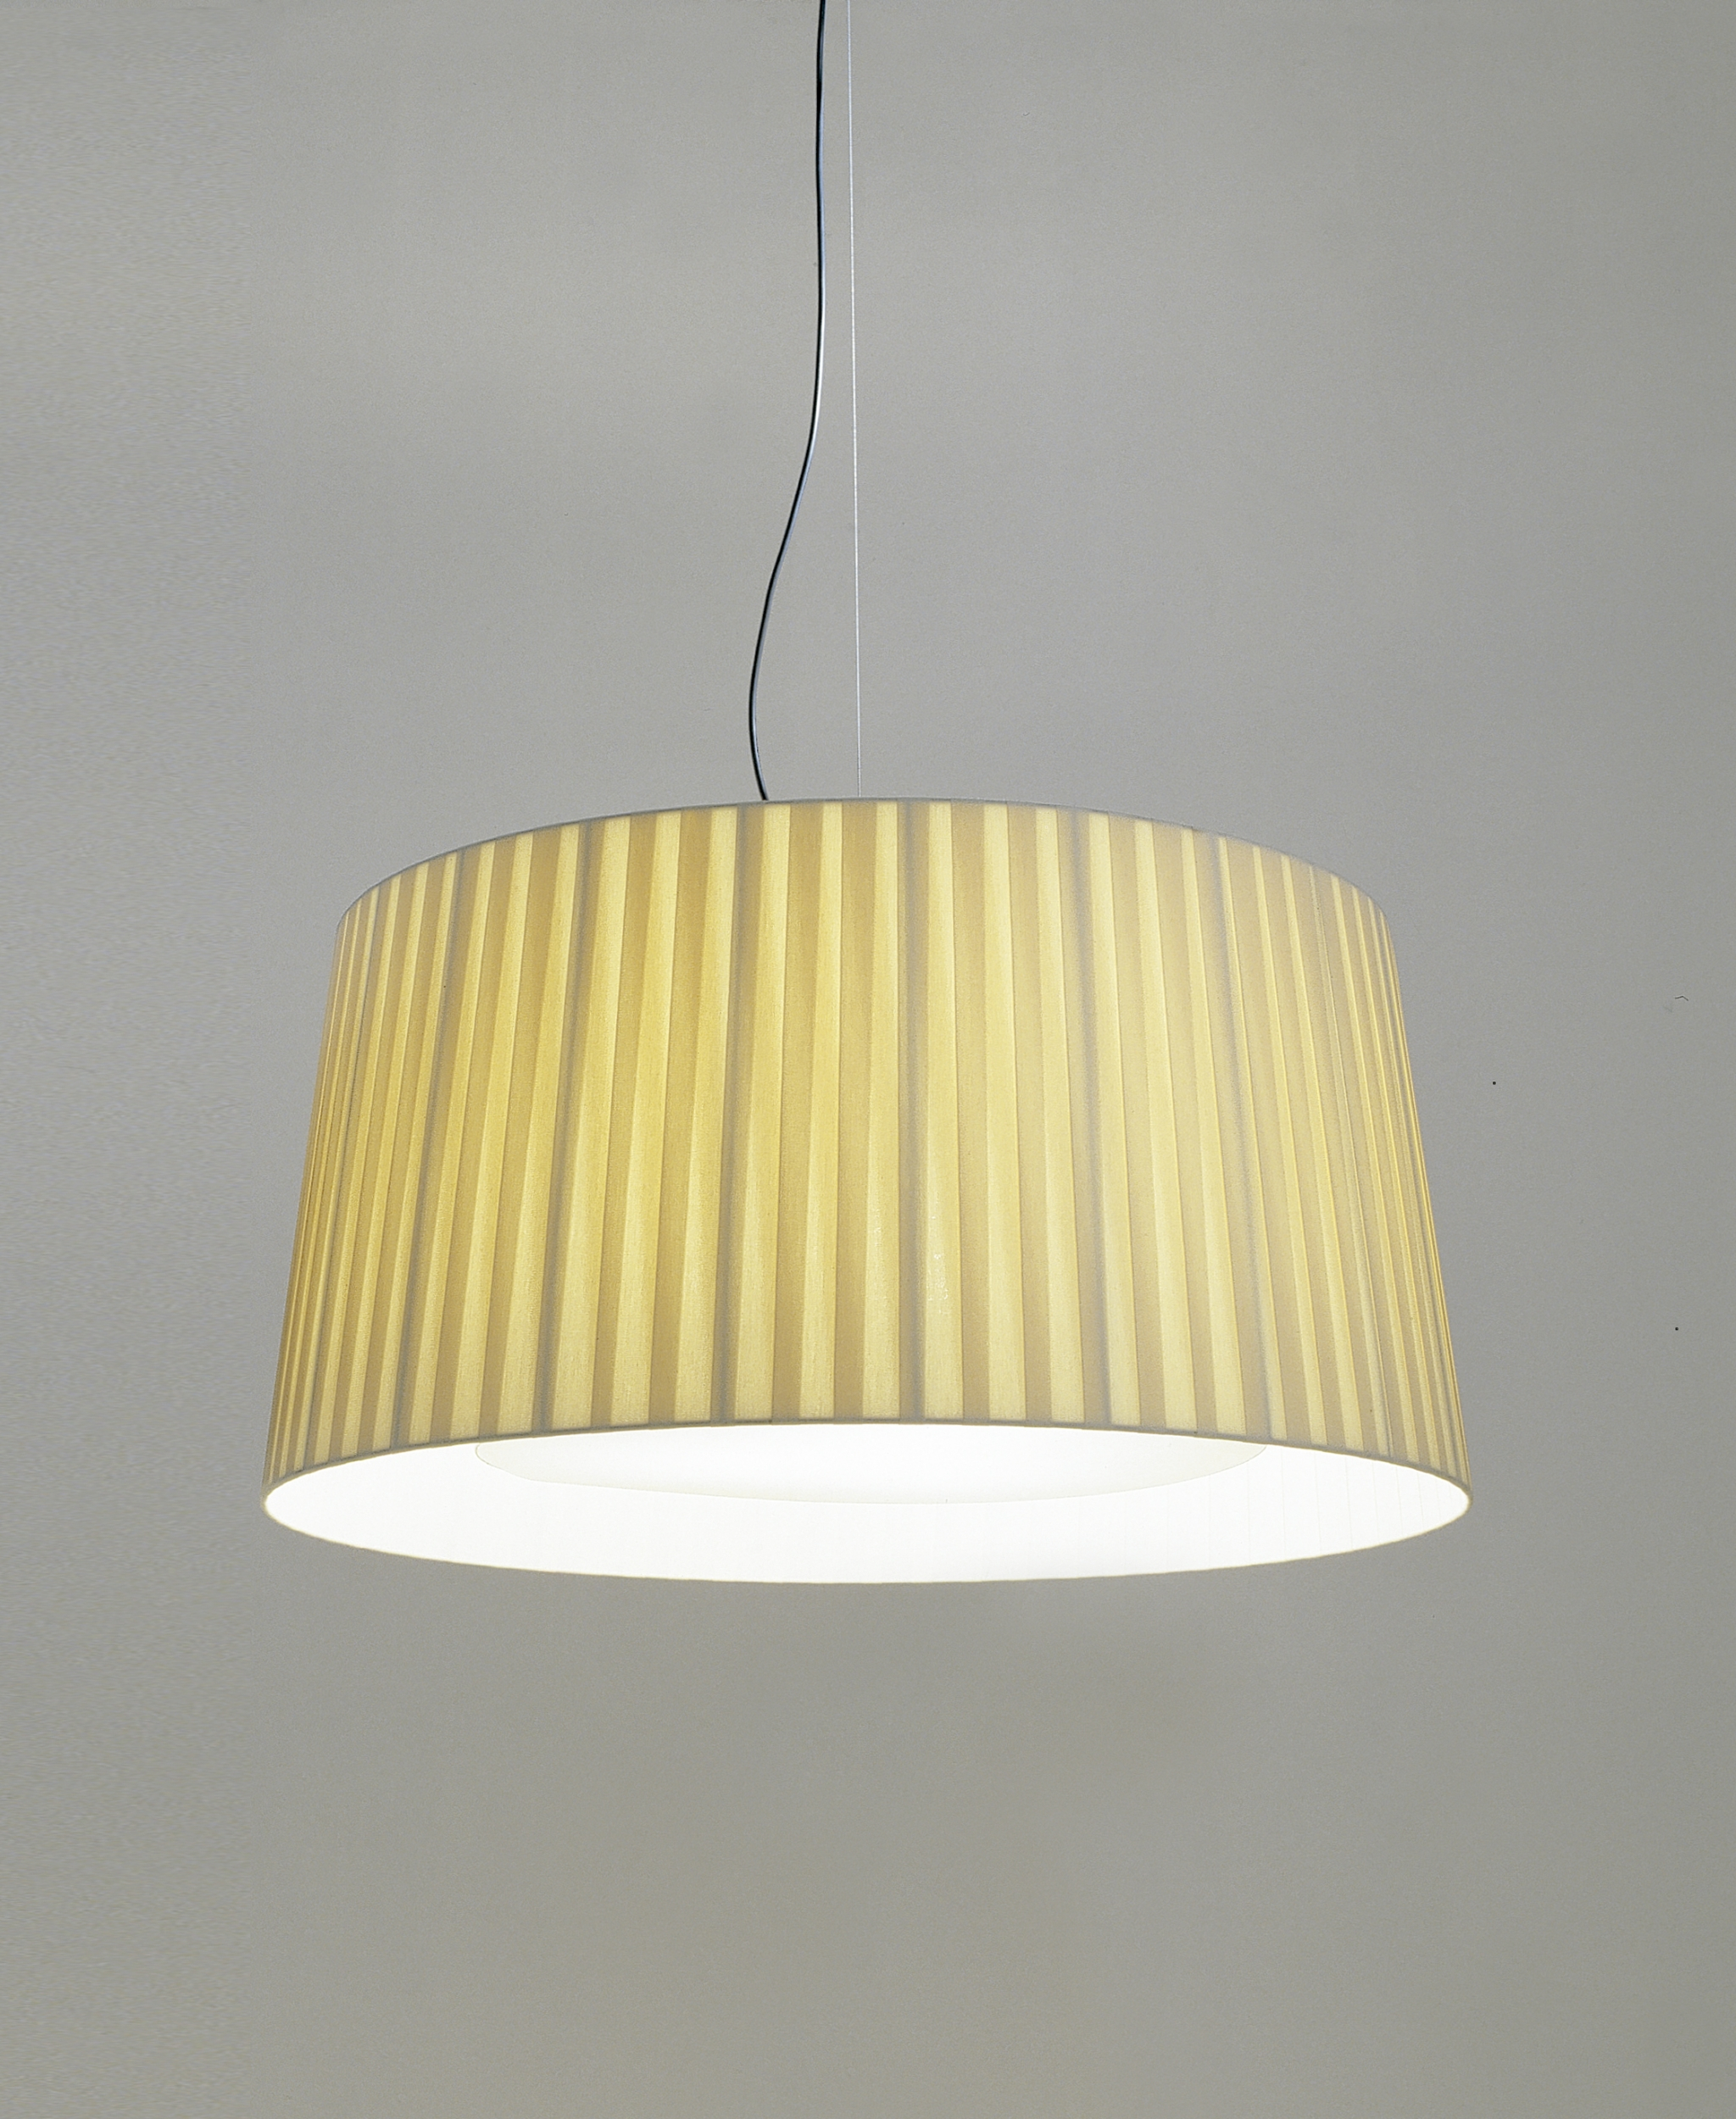 lamp panel distributor designs led er home design light full cabinet enchanting images also cupboard ideas for